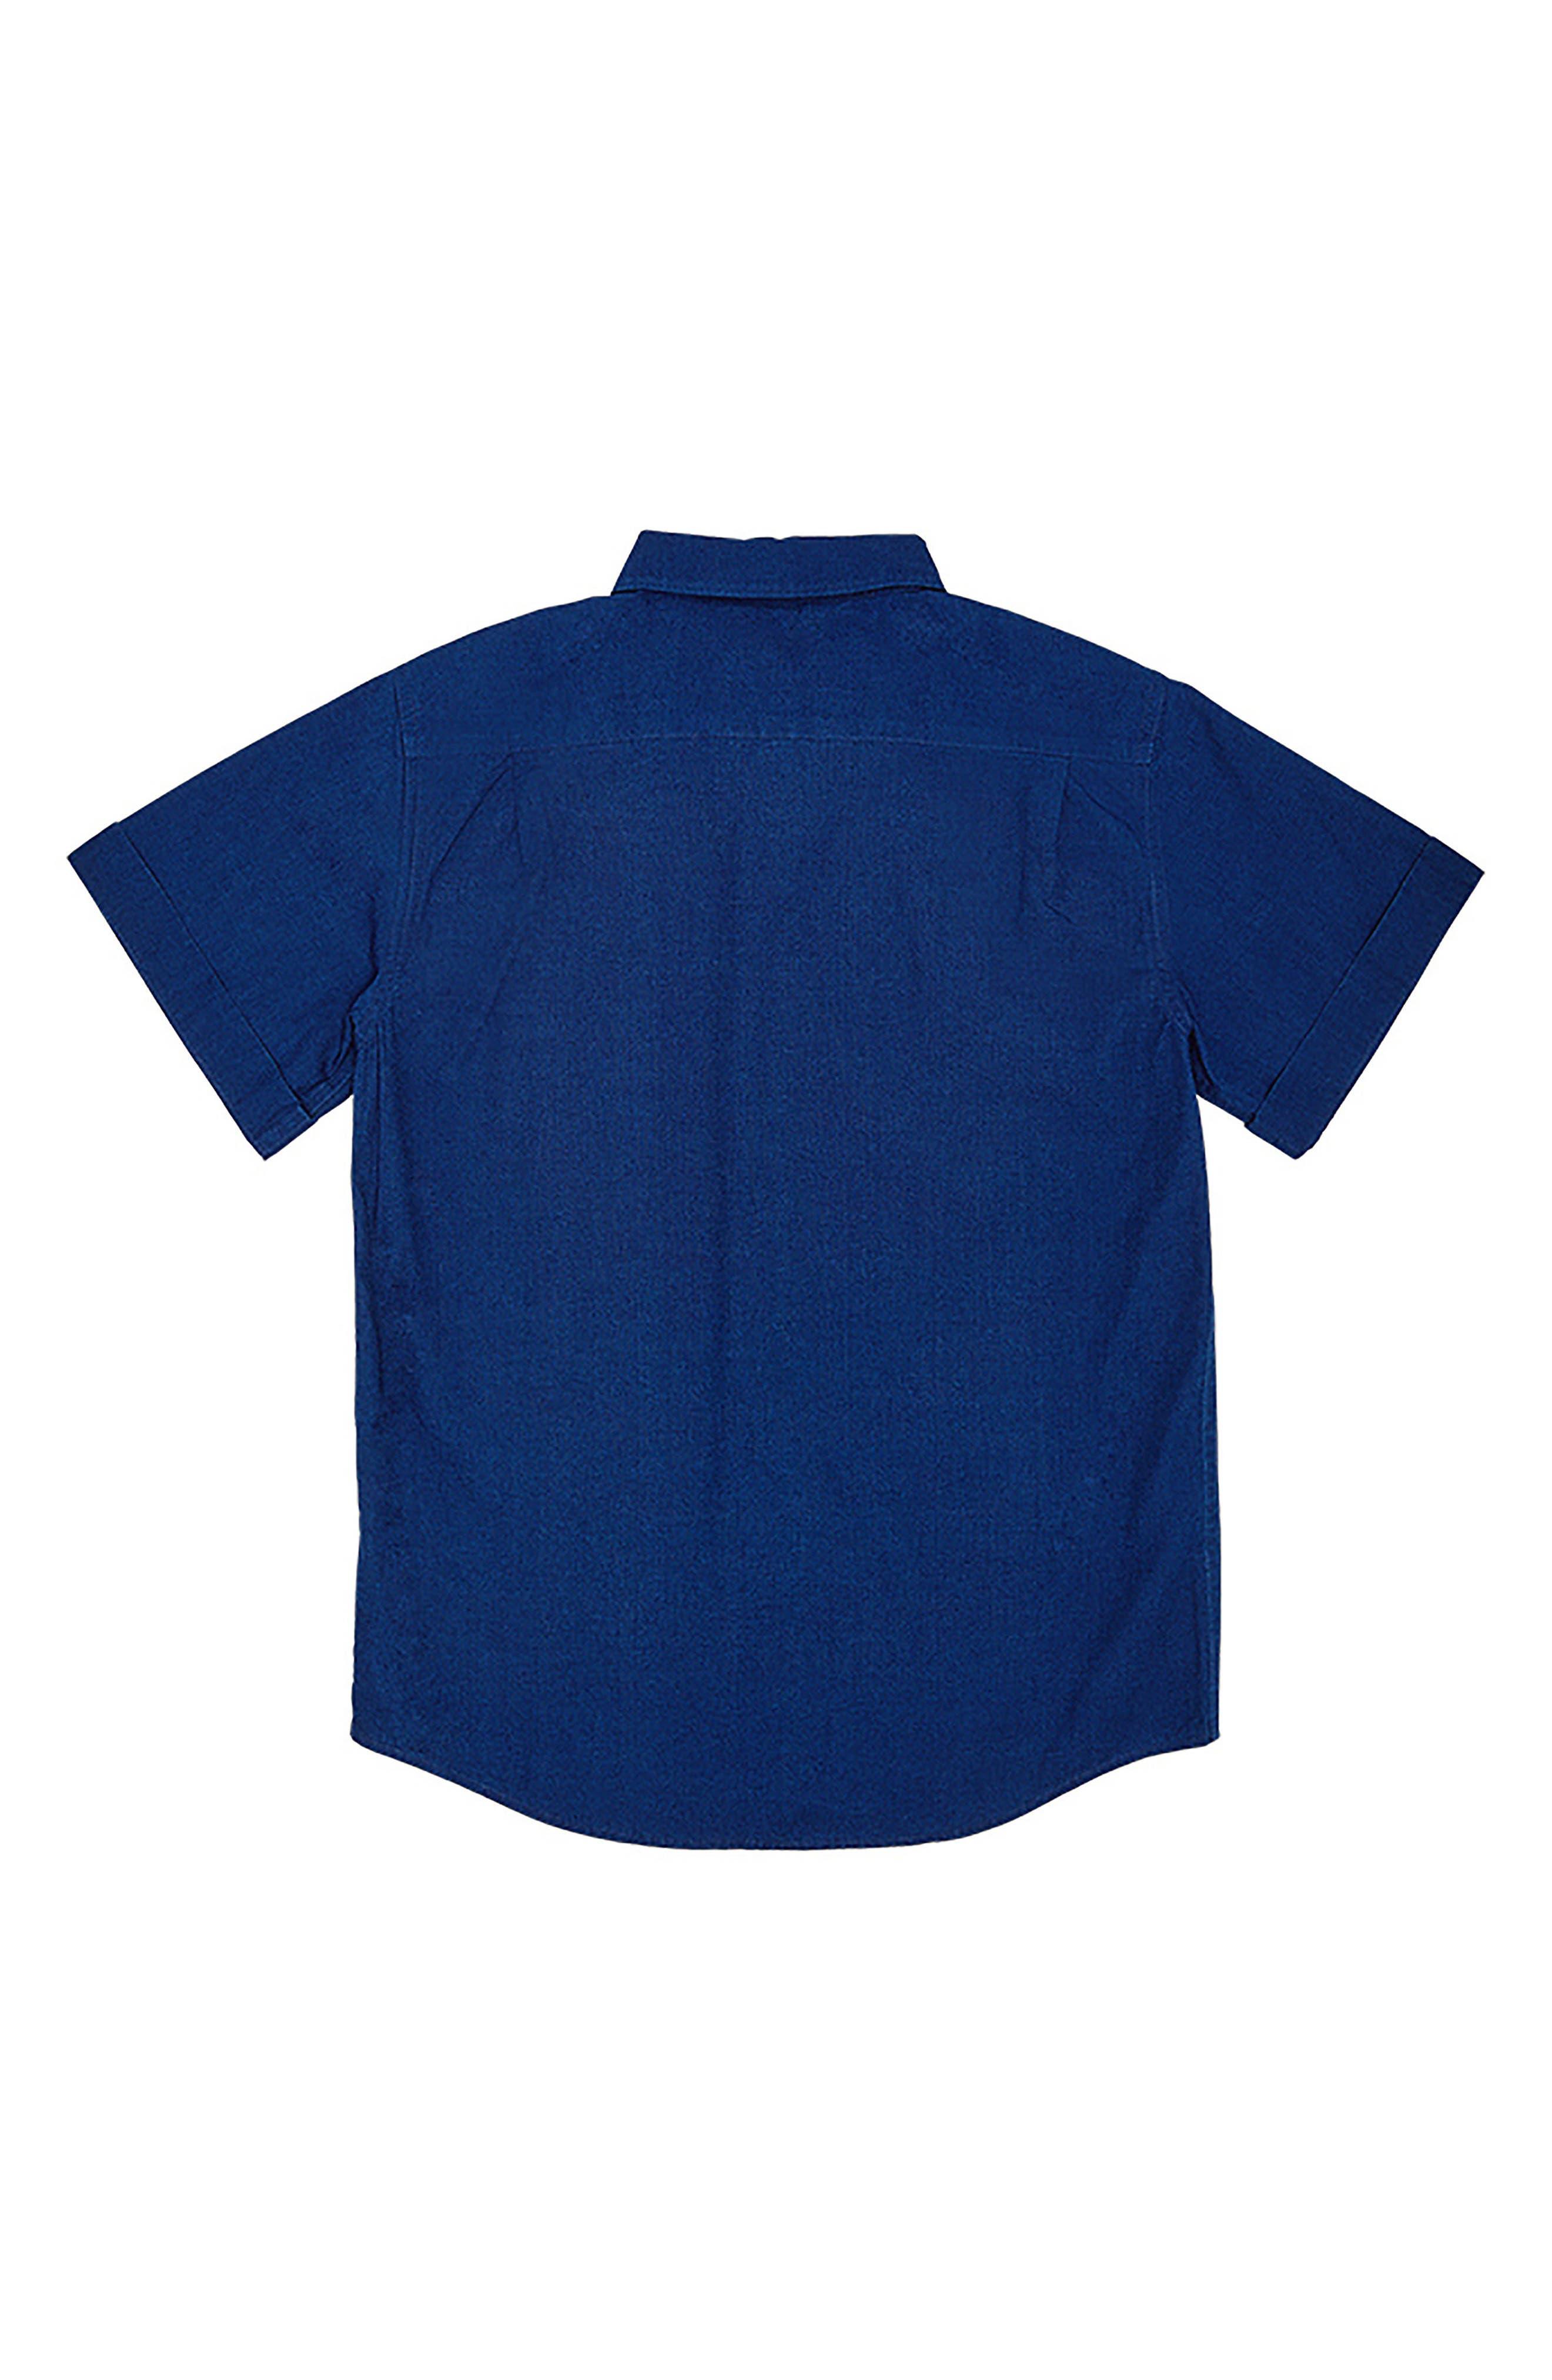 DL 1961 Ash Woven Shirt,                             Alternate thumbnail 2, color,                             Indigo Plaid